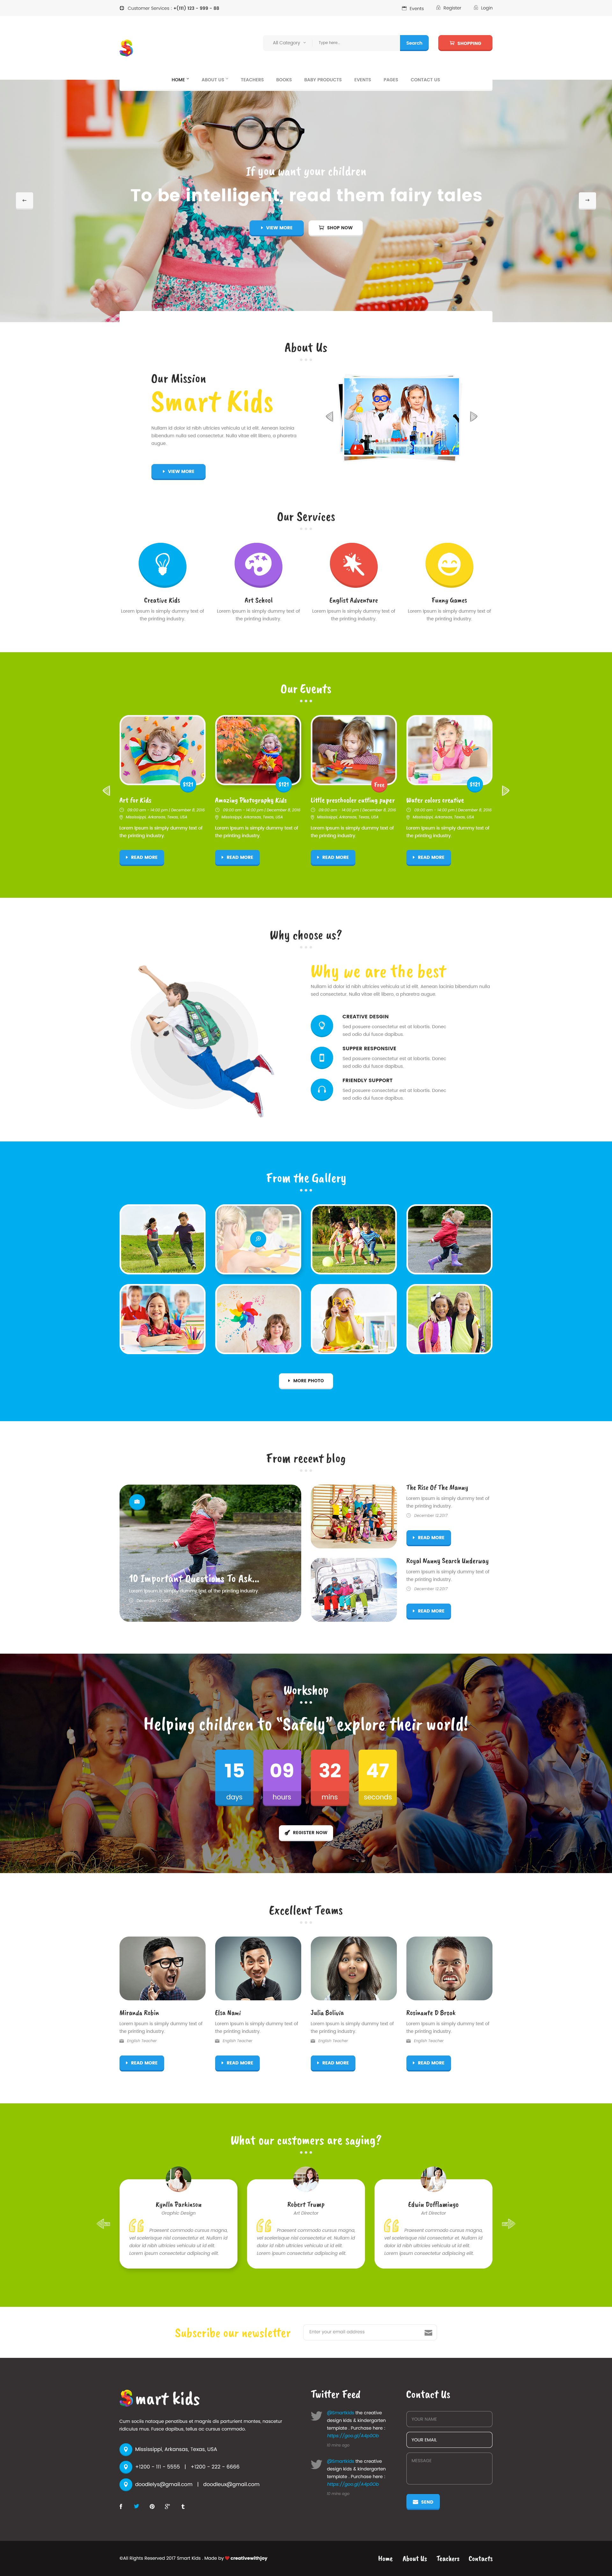 Smart Kids - Multipopurse Creative Kids Kindergarten PSD Template | Kita